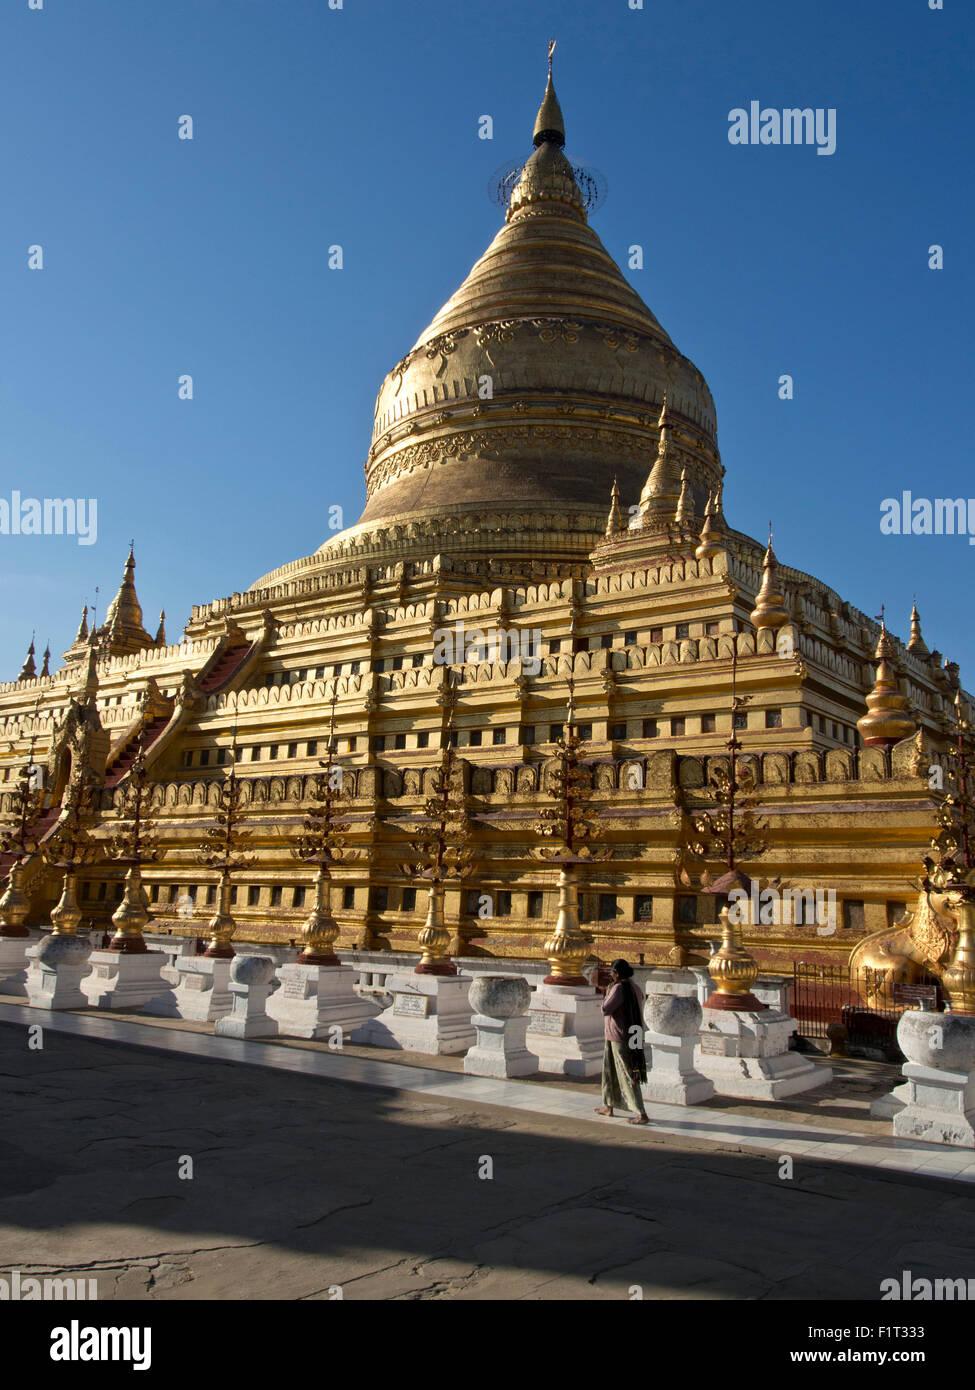 The Shwe Zigon, a Buddhist temple, Nyaung-U, near Bagan (Pagan), Myanmar (Burma), Asia Stock Photo